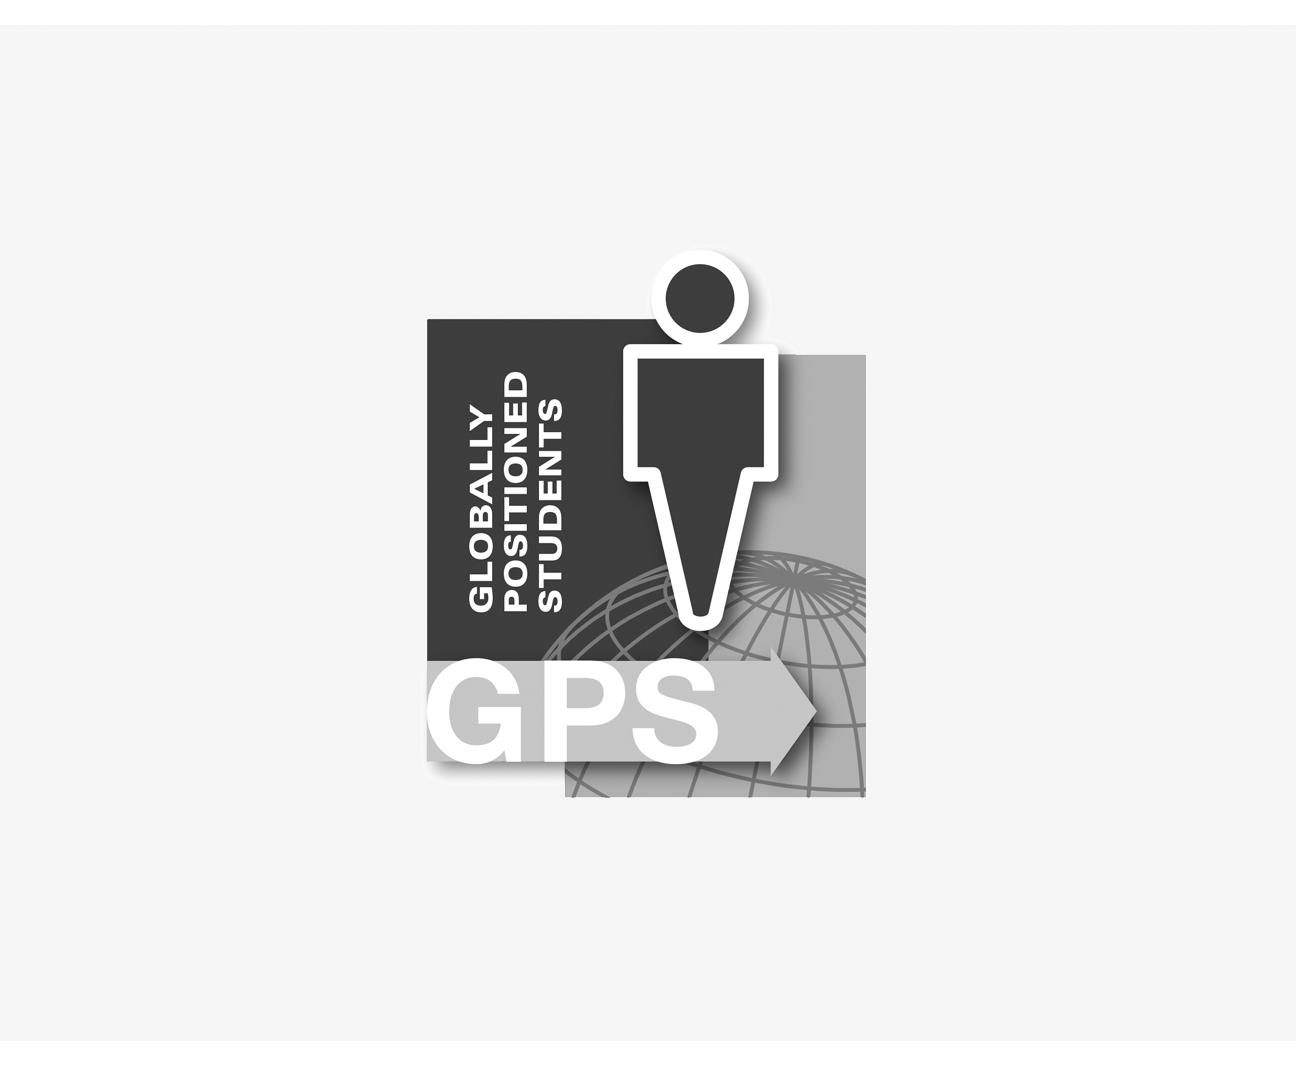 logo_gps_gs.jpg